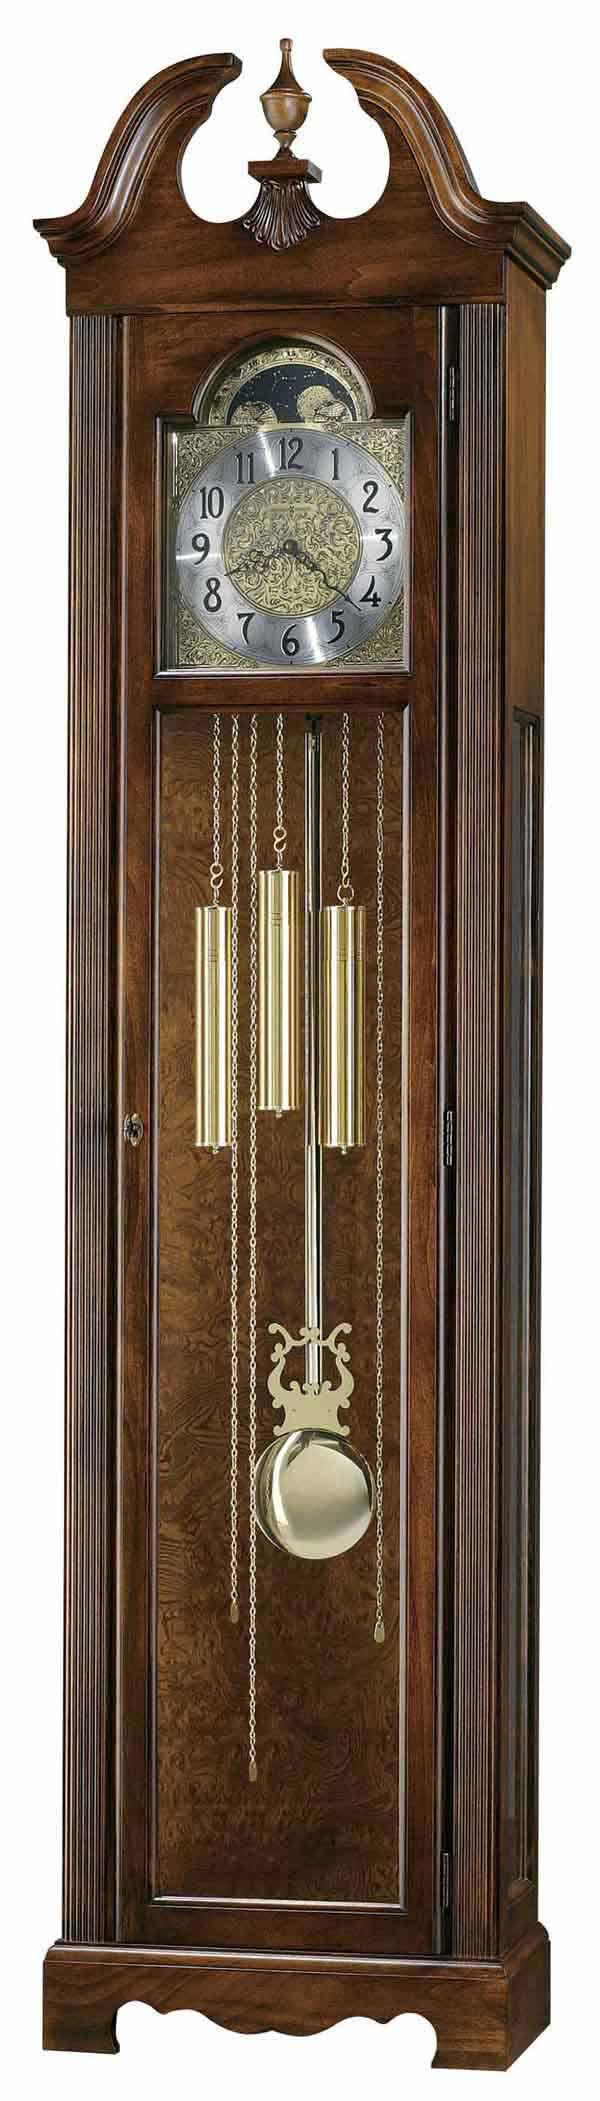 howard miller grandfather clock serial number lookup